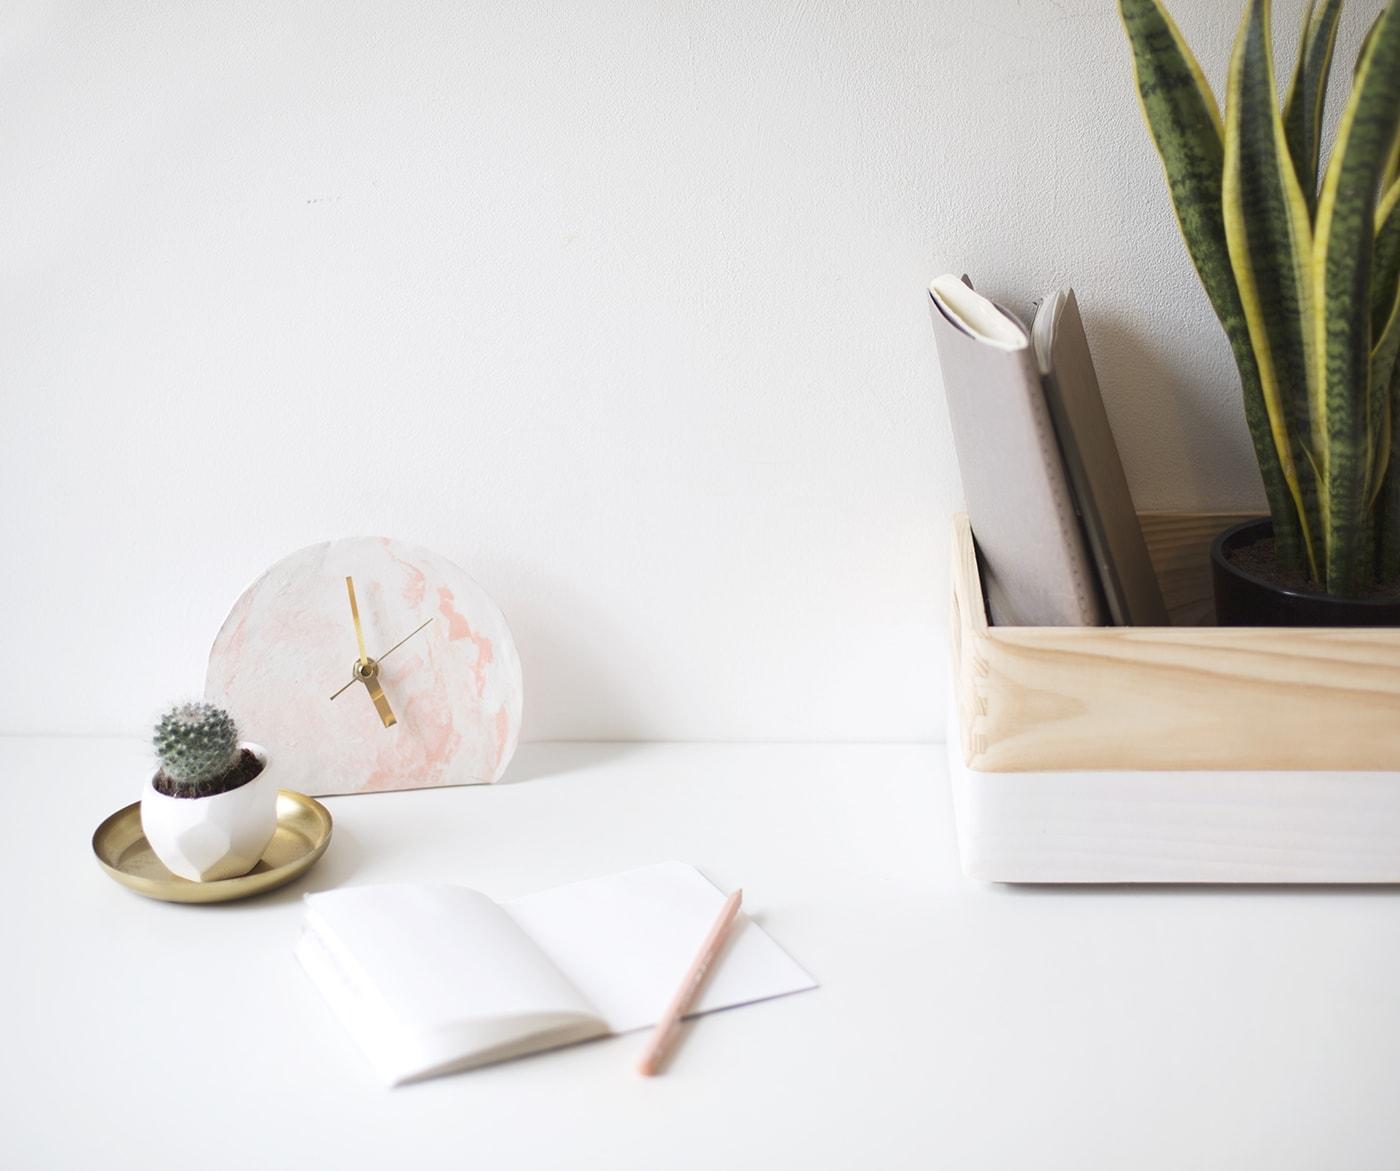 mini-standing-desk-clock-diy-easy-tutorial-polymer-clay